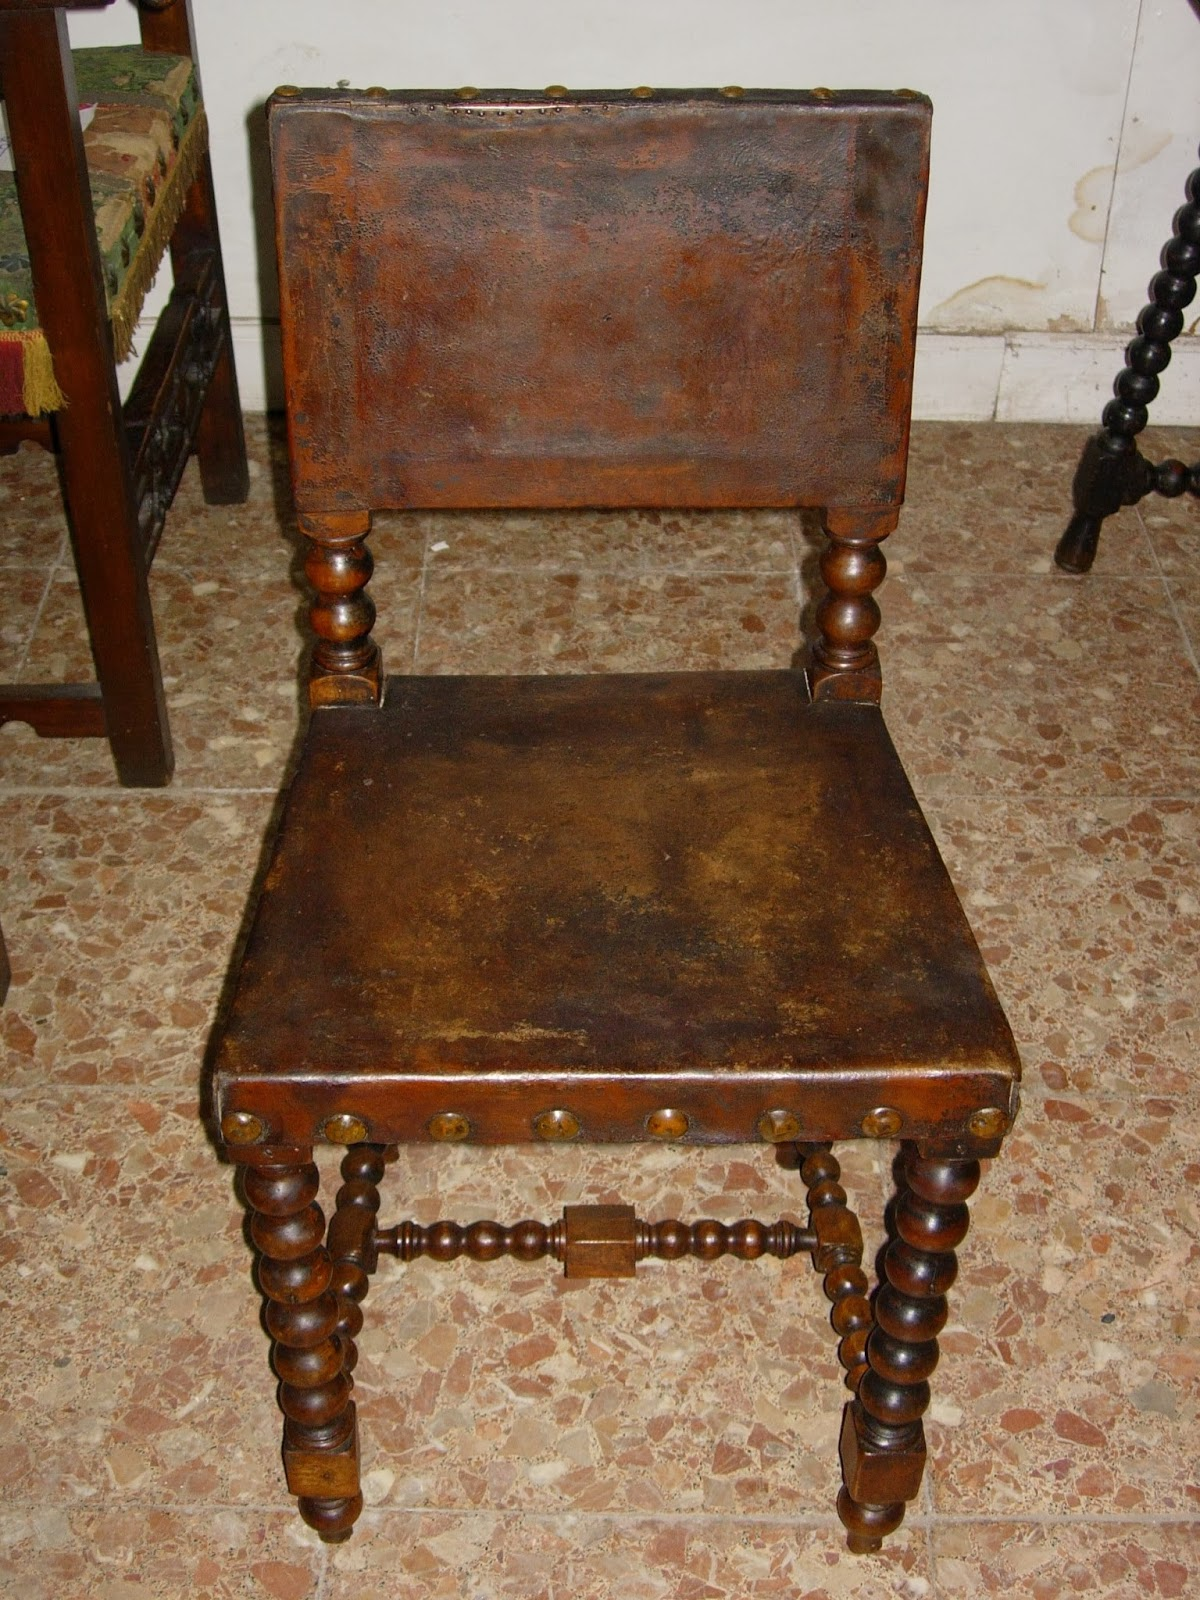 Antig edades fern ndez muebles mesas sillas - Tapizado de sillas antiguas ...